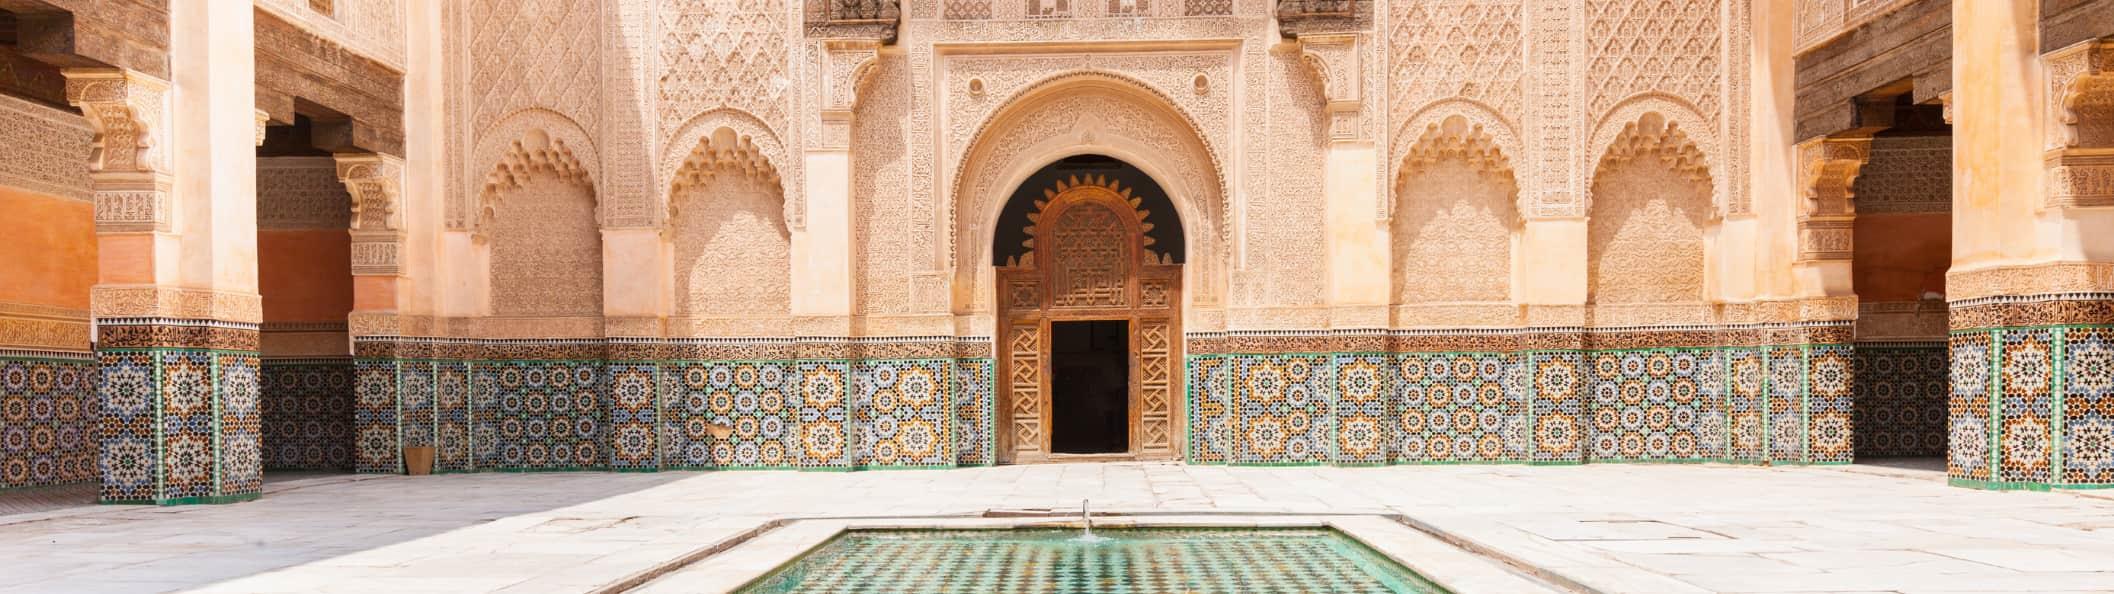 Madrasa de Ben Youssef | Portada